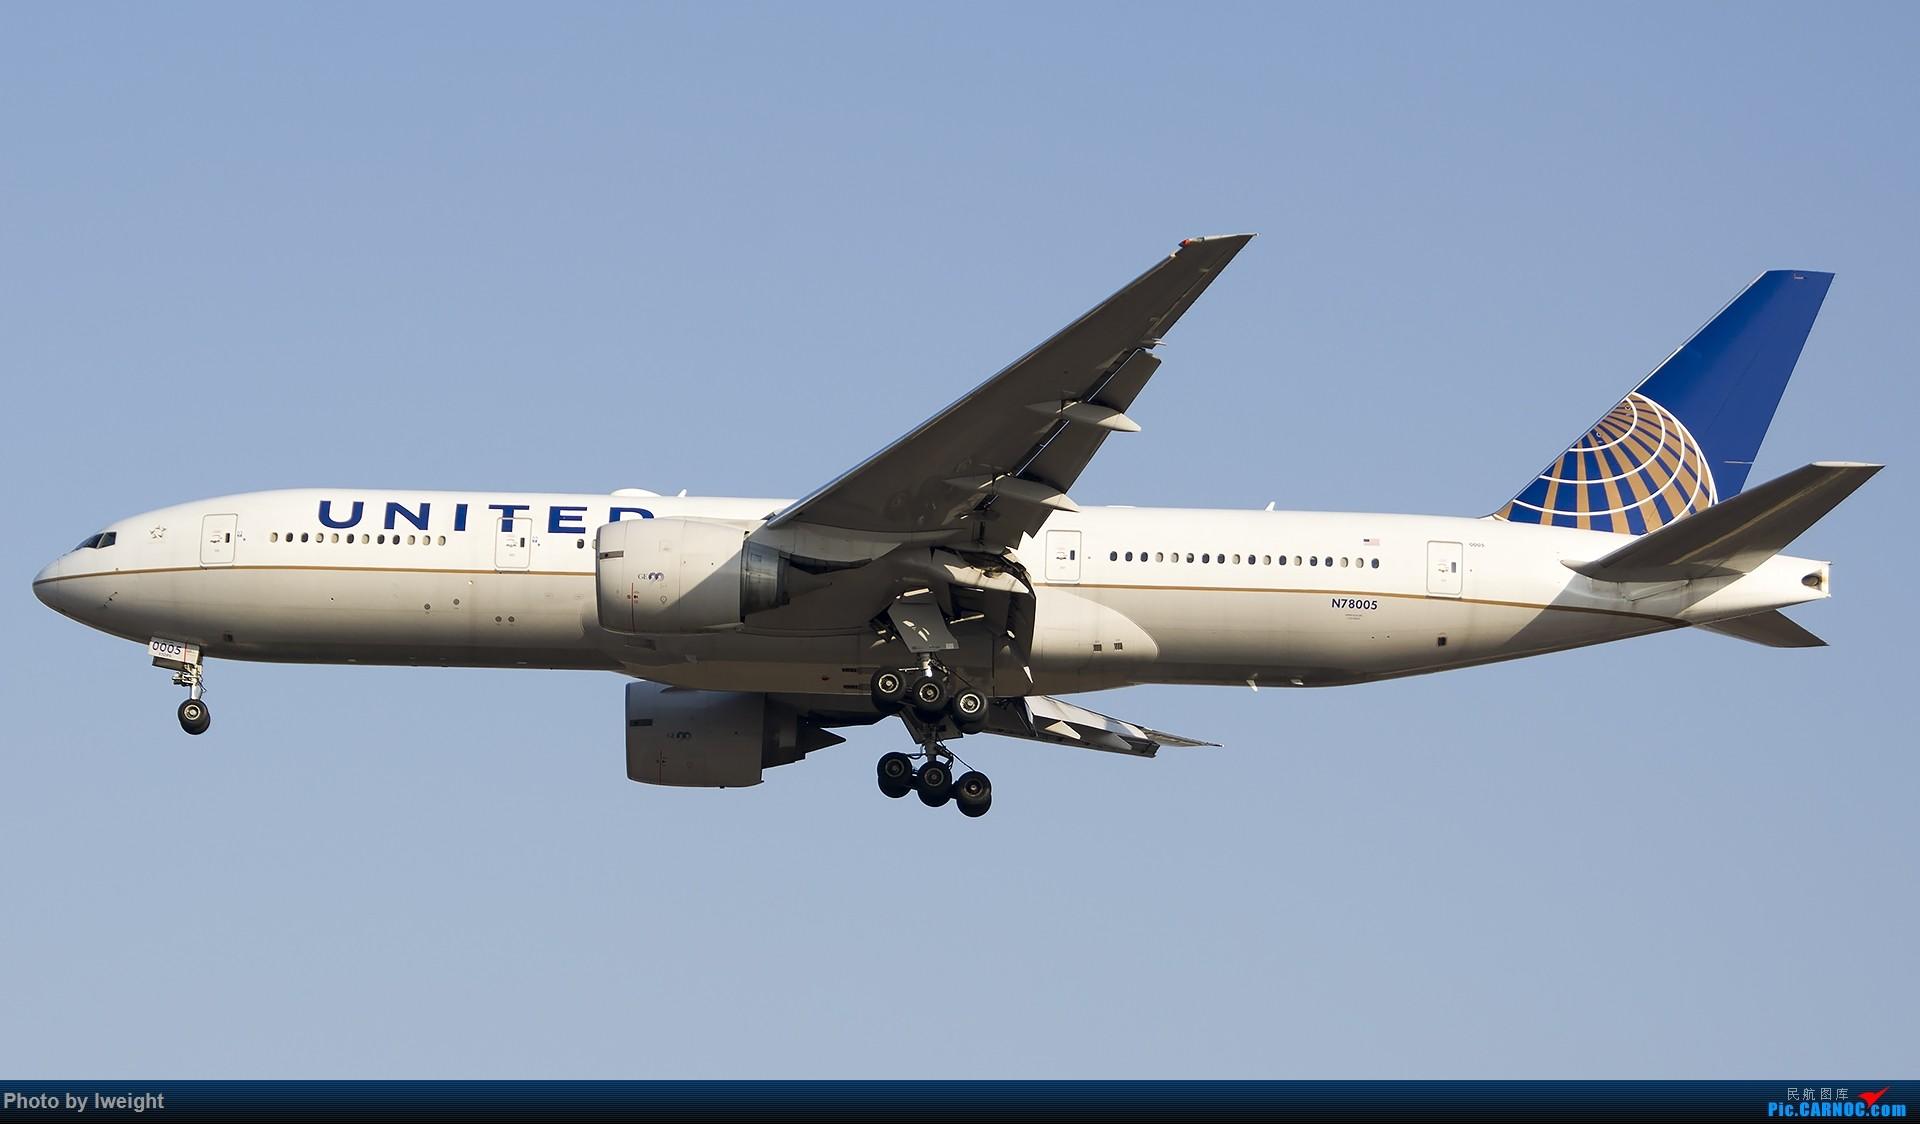 Re:[原创]2014-12-02 ZBAA随拍 BOEING 777-200ER N78005 中国北京首都国际机场